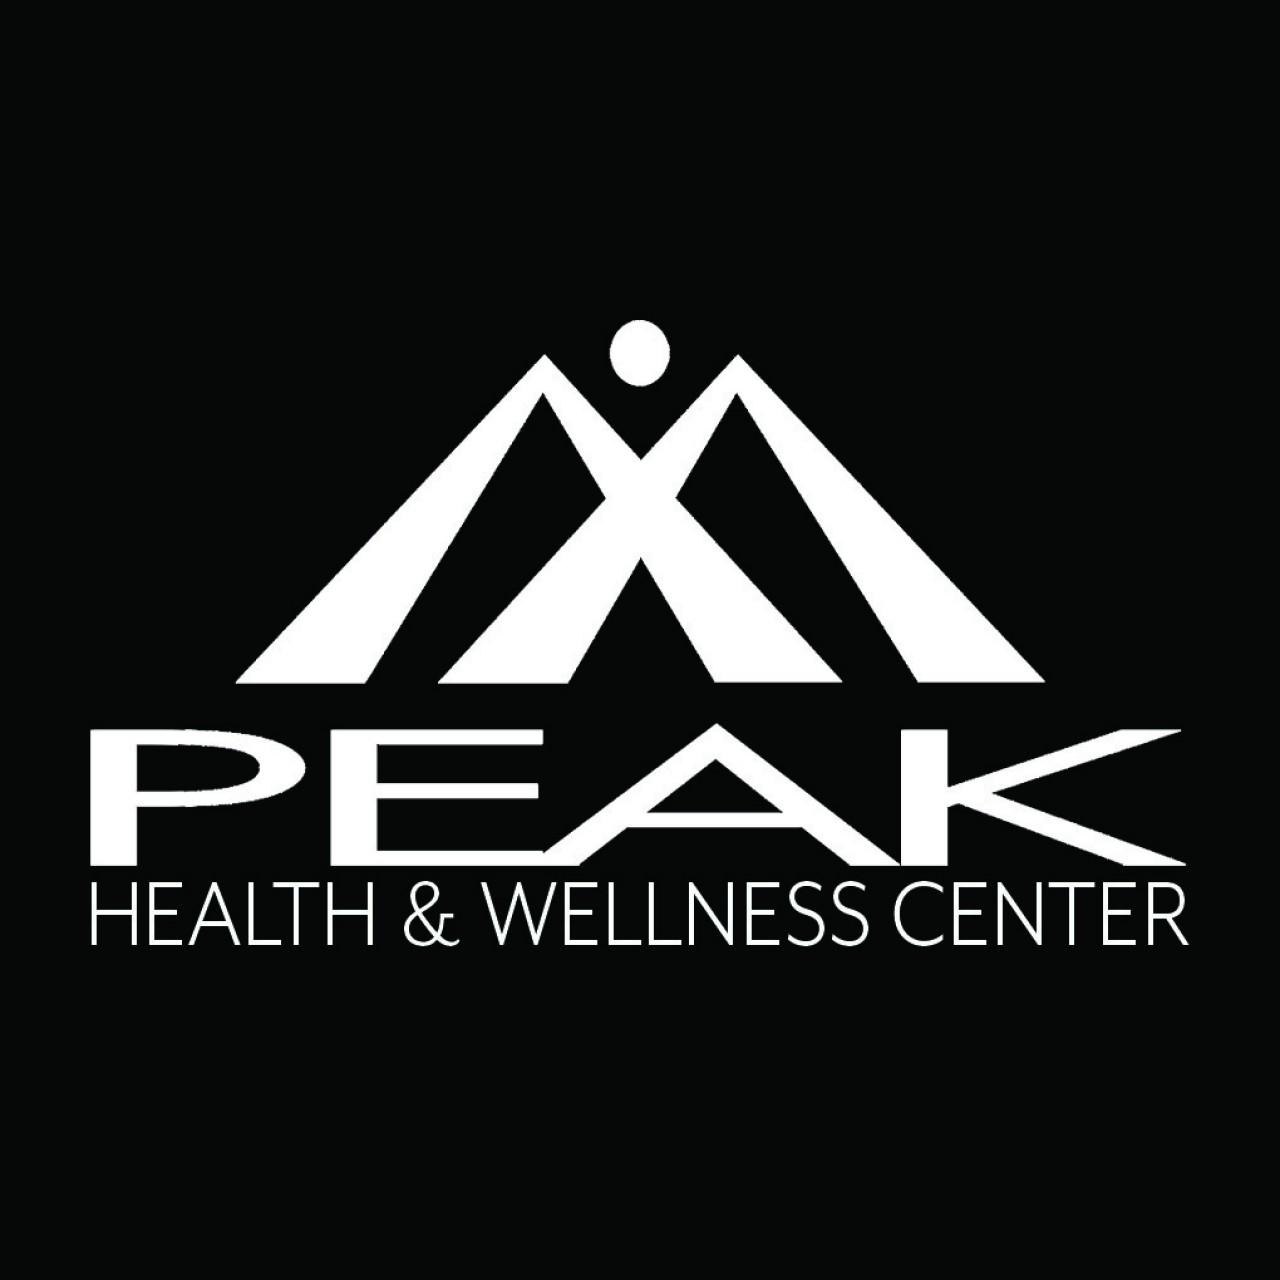 Peak Health & Wellness Center